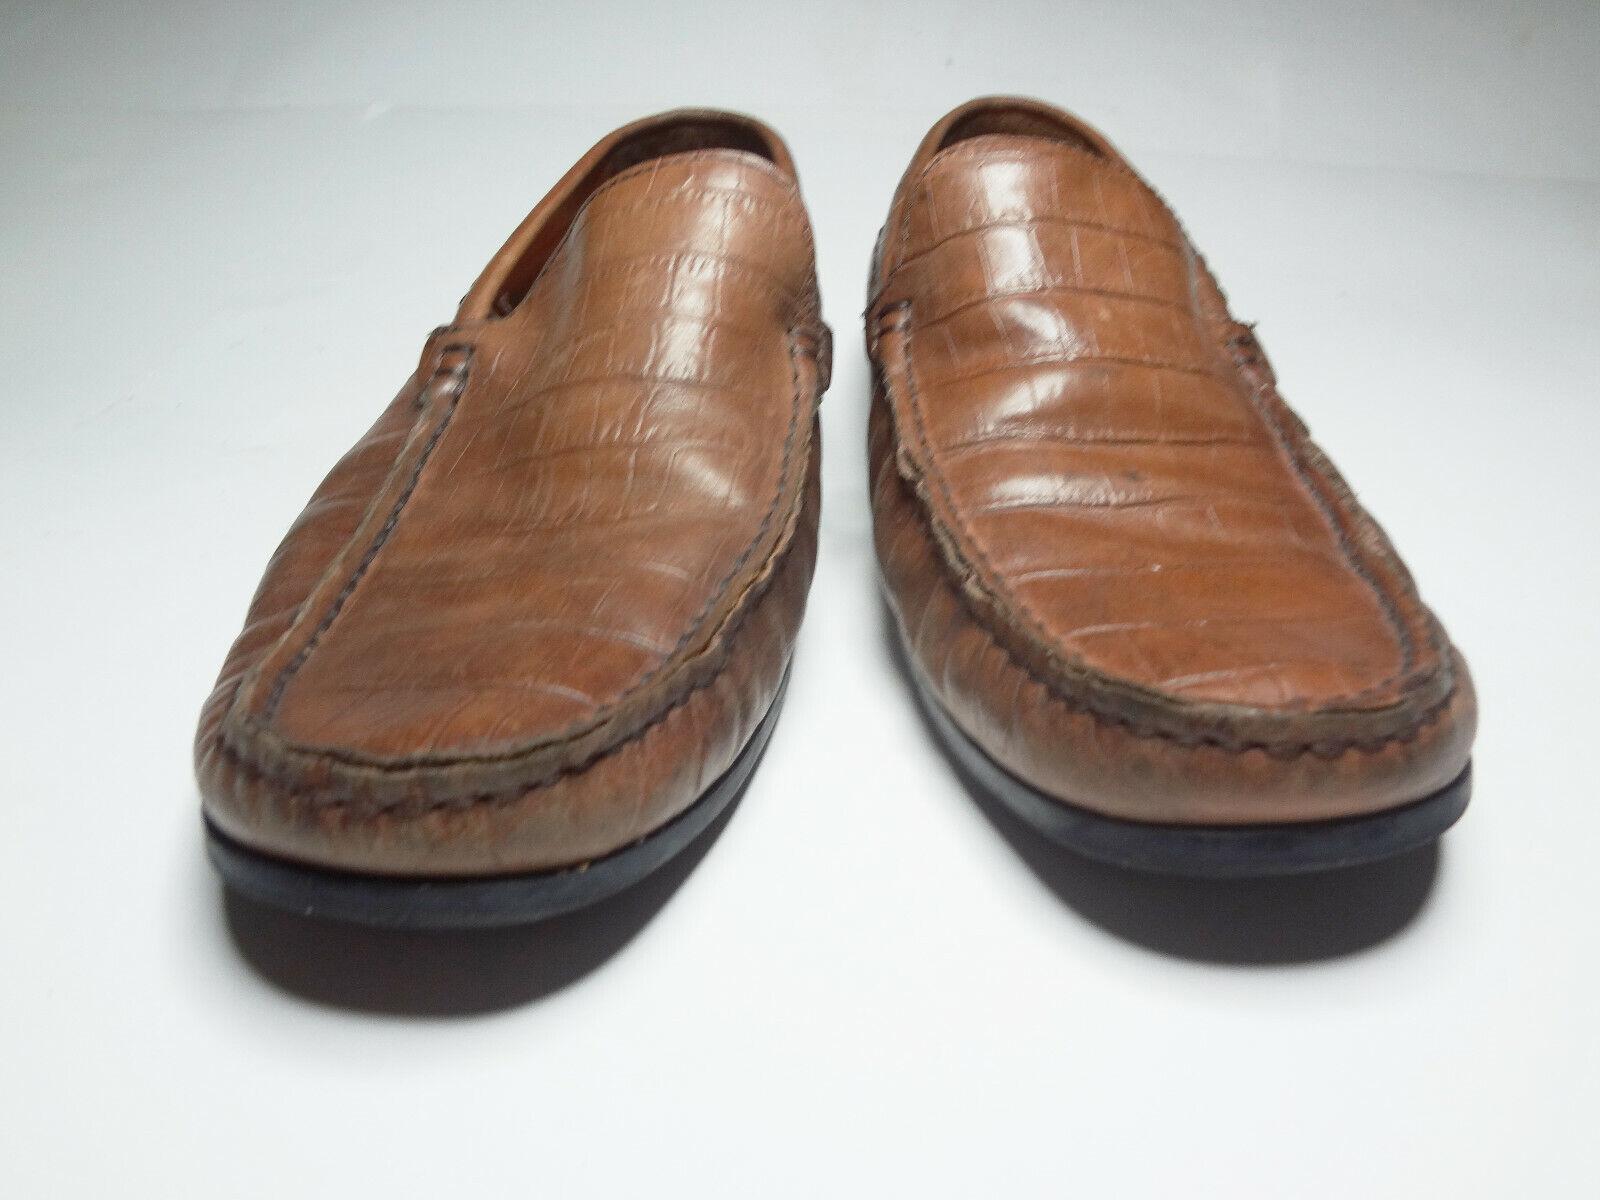 Donald Pliner Iggy Loafer Slip On Gator Print Driving Moc Toe Mens Size 8.5M